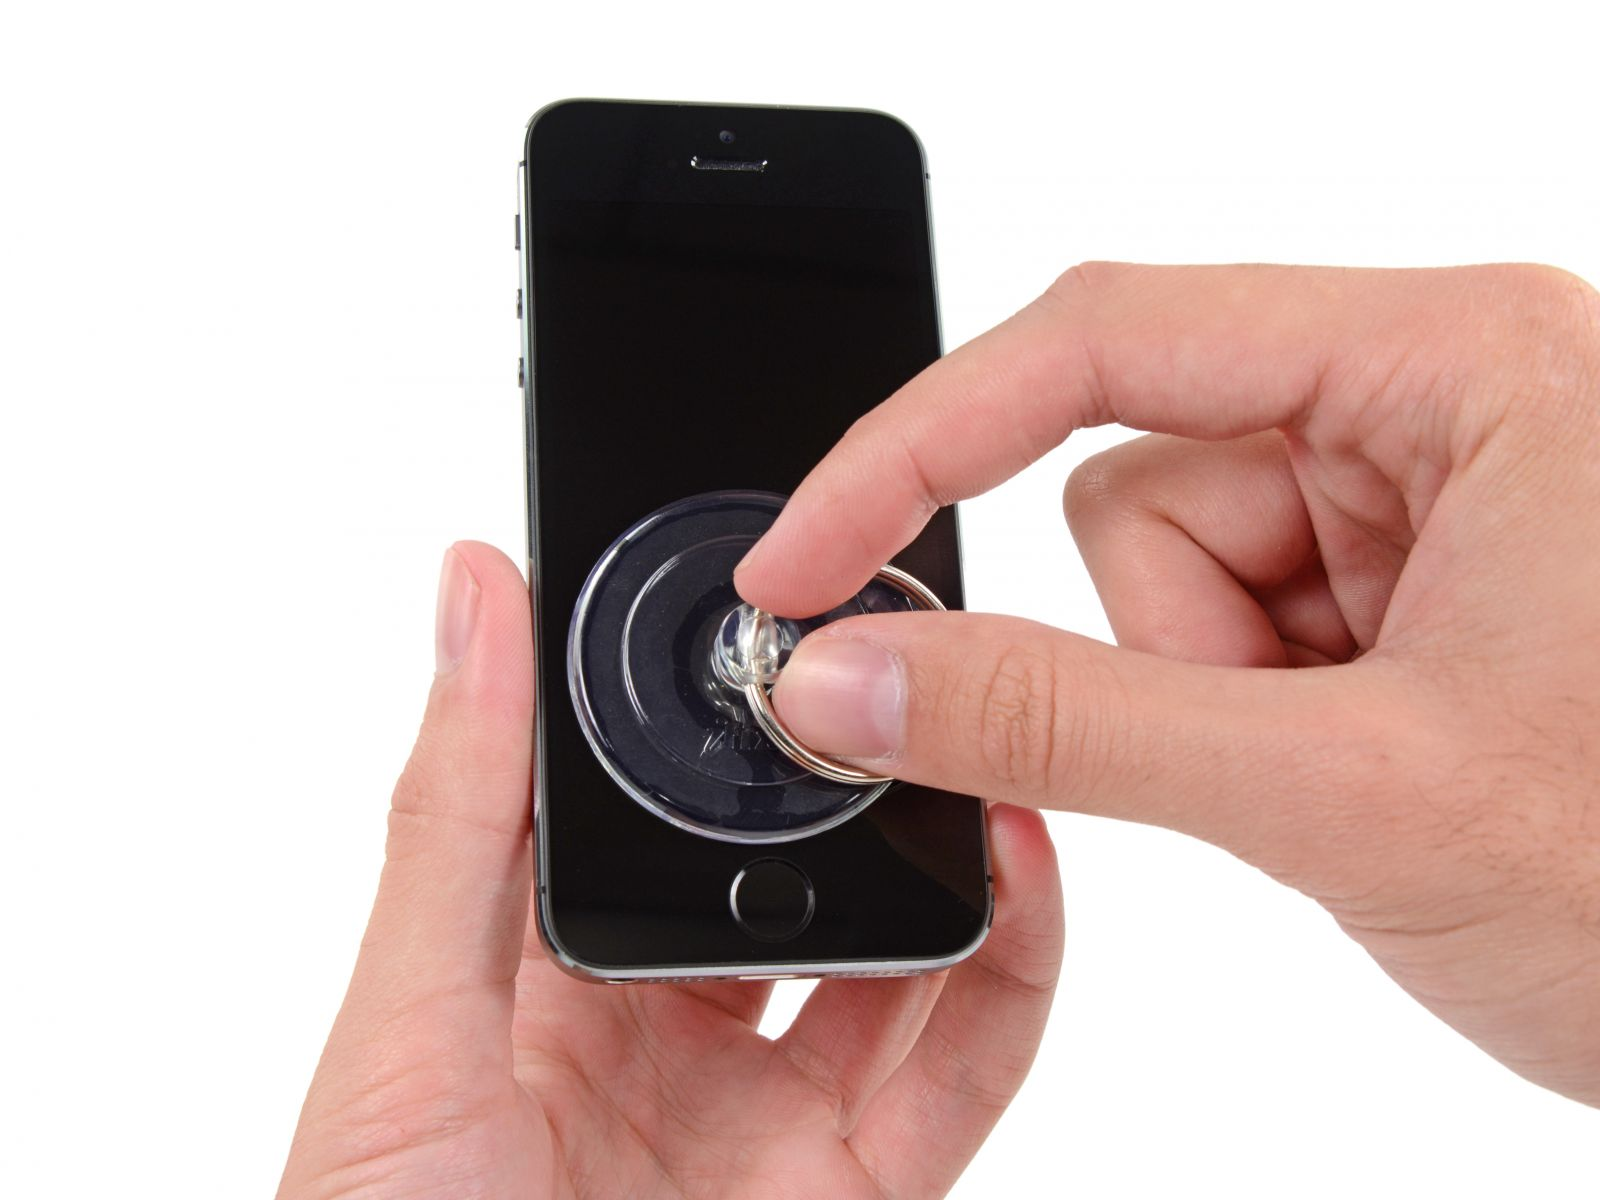 Замета аккумулятора на iPhone 5S (6)